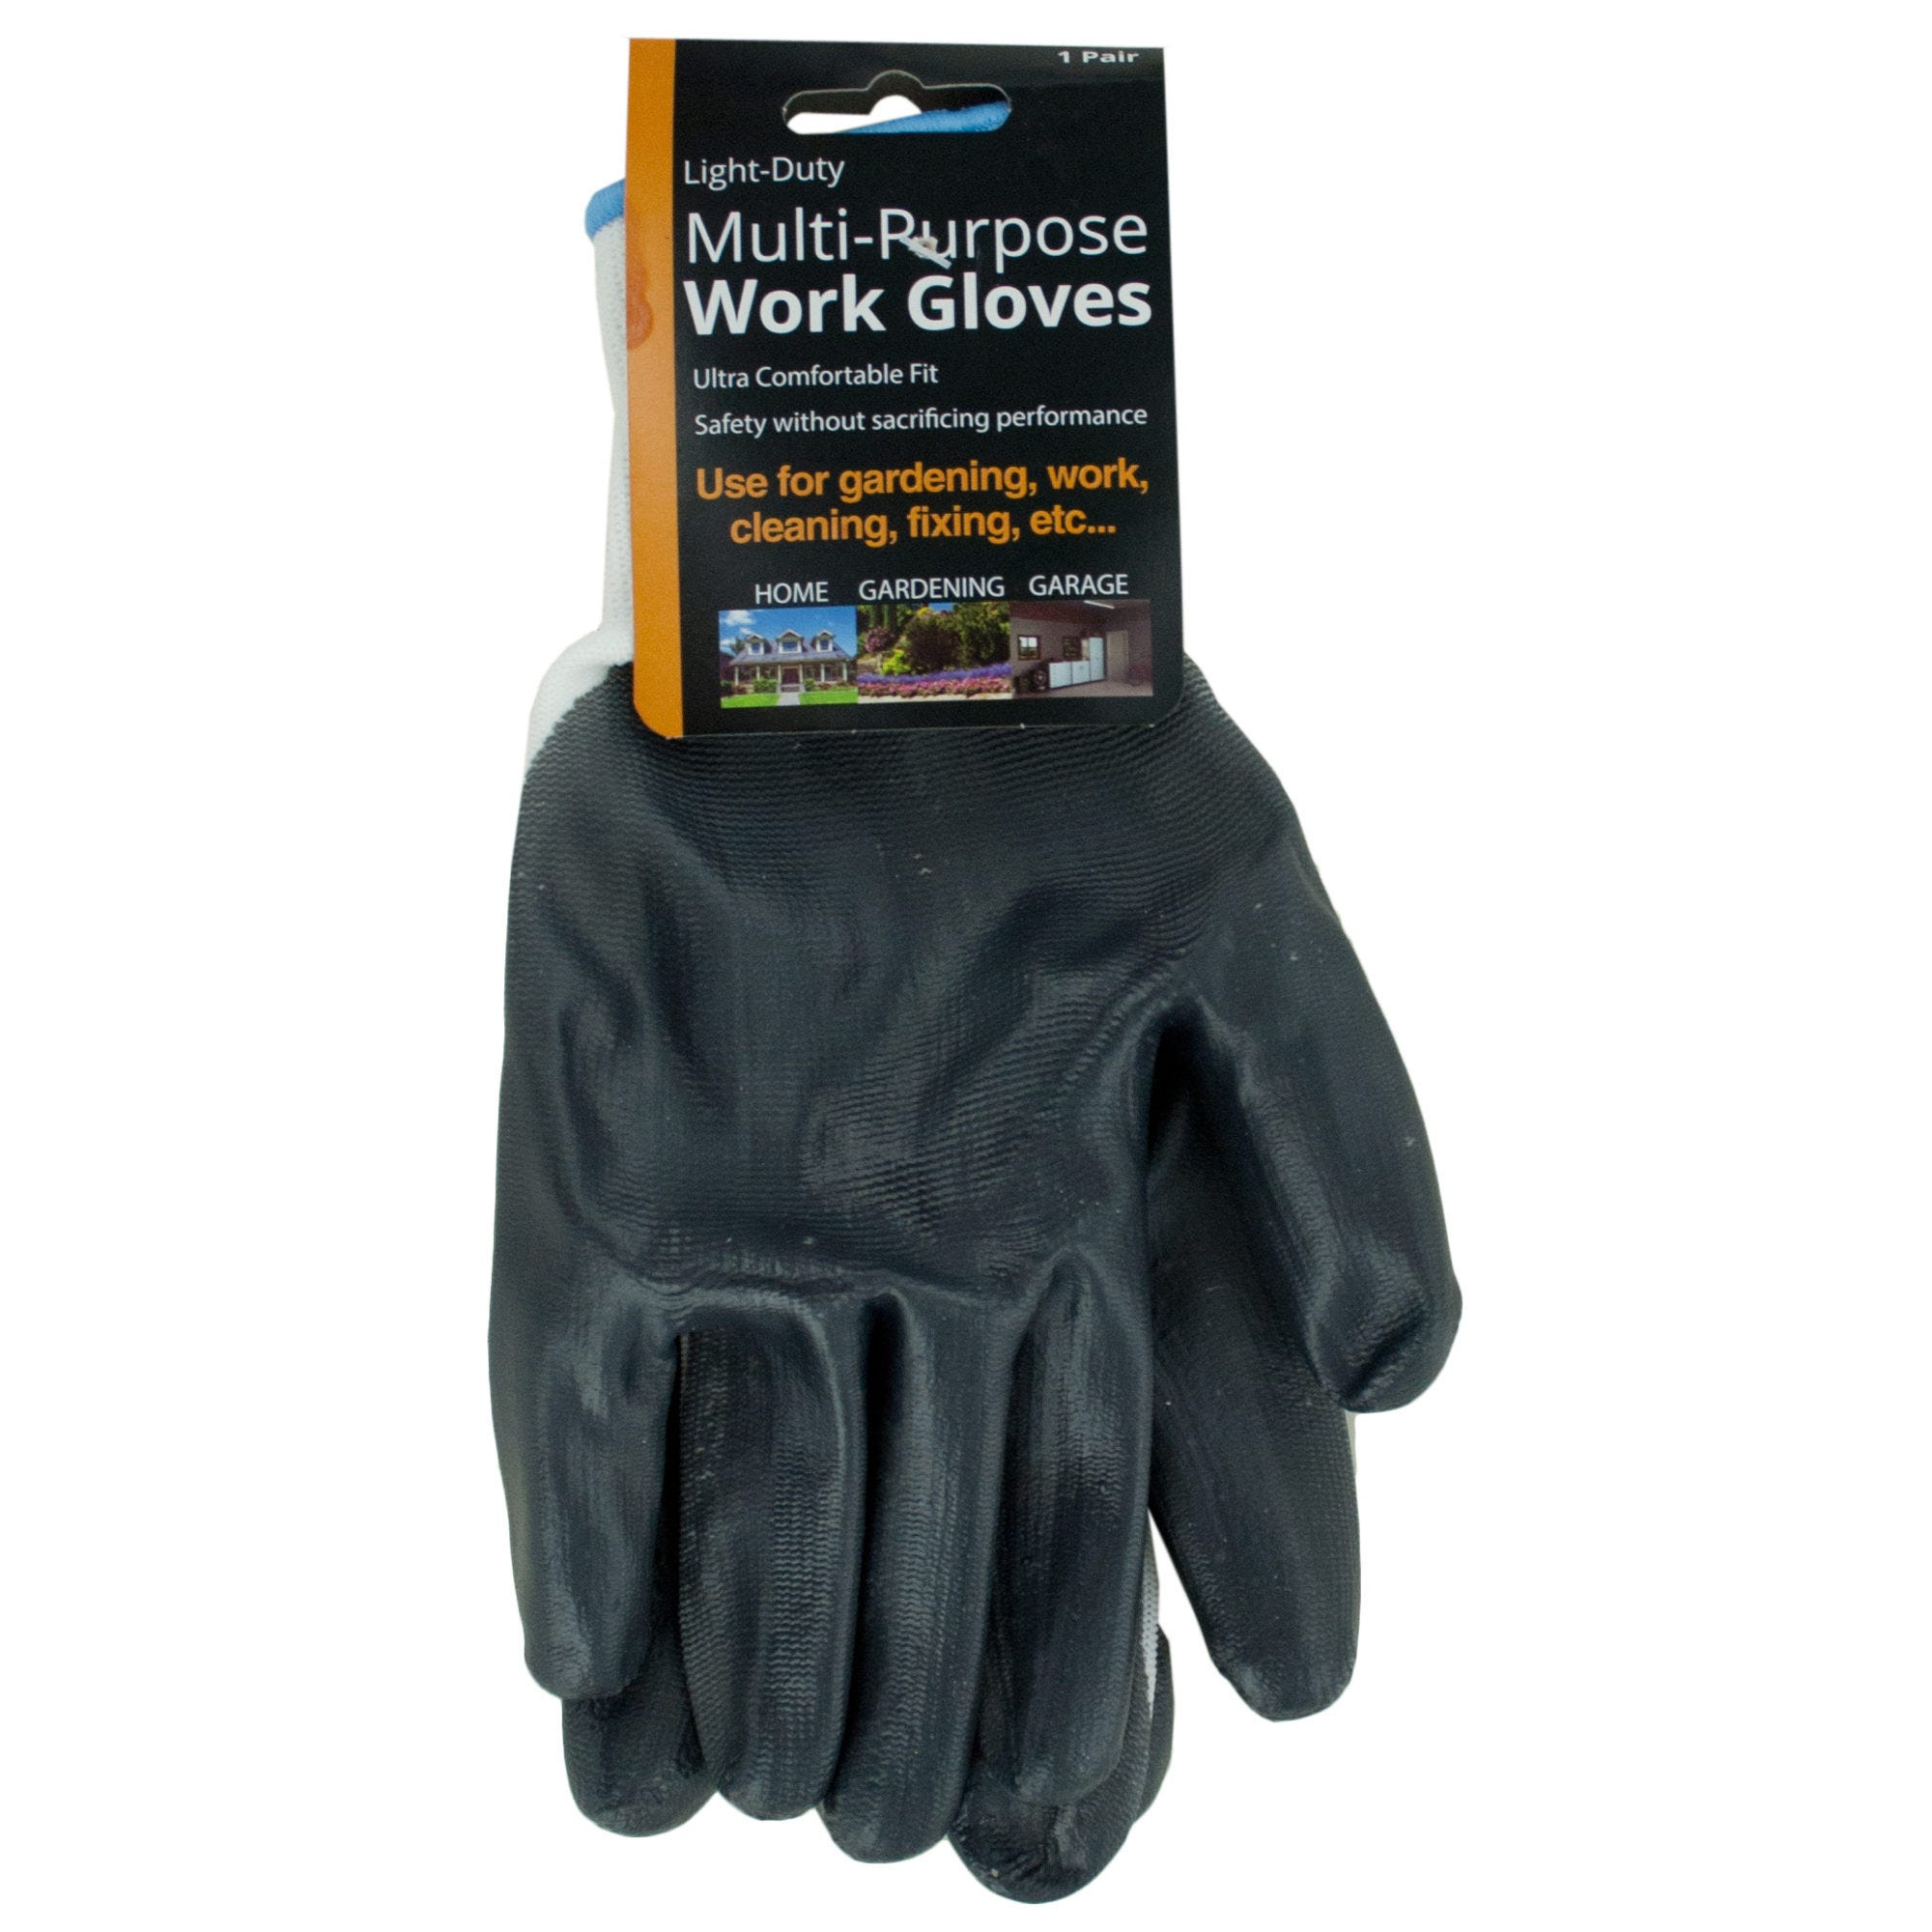 Light-Duty Multi-Purpose Work Gloves